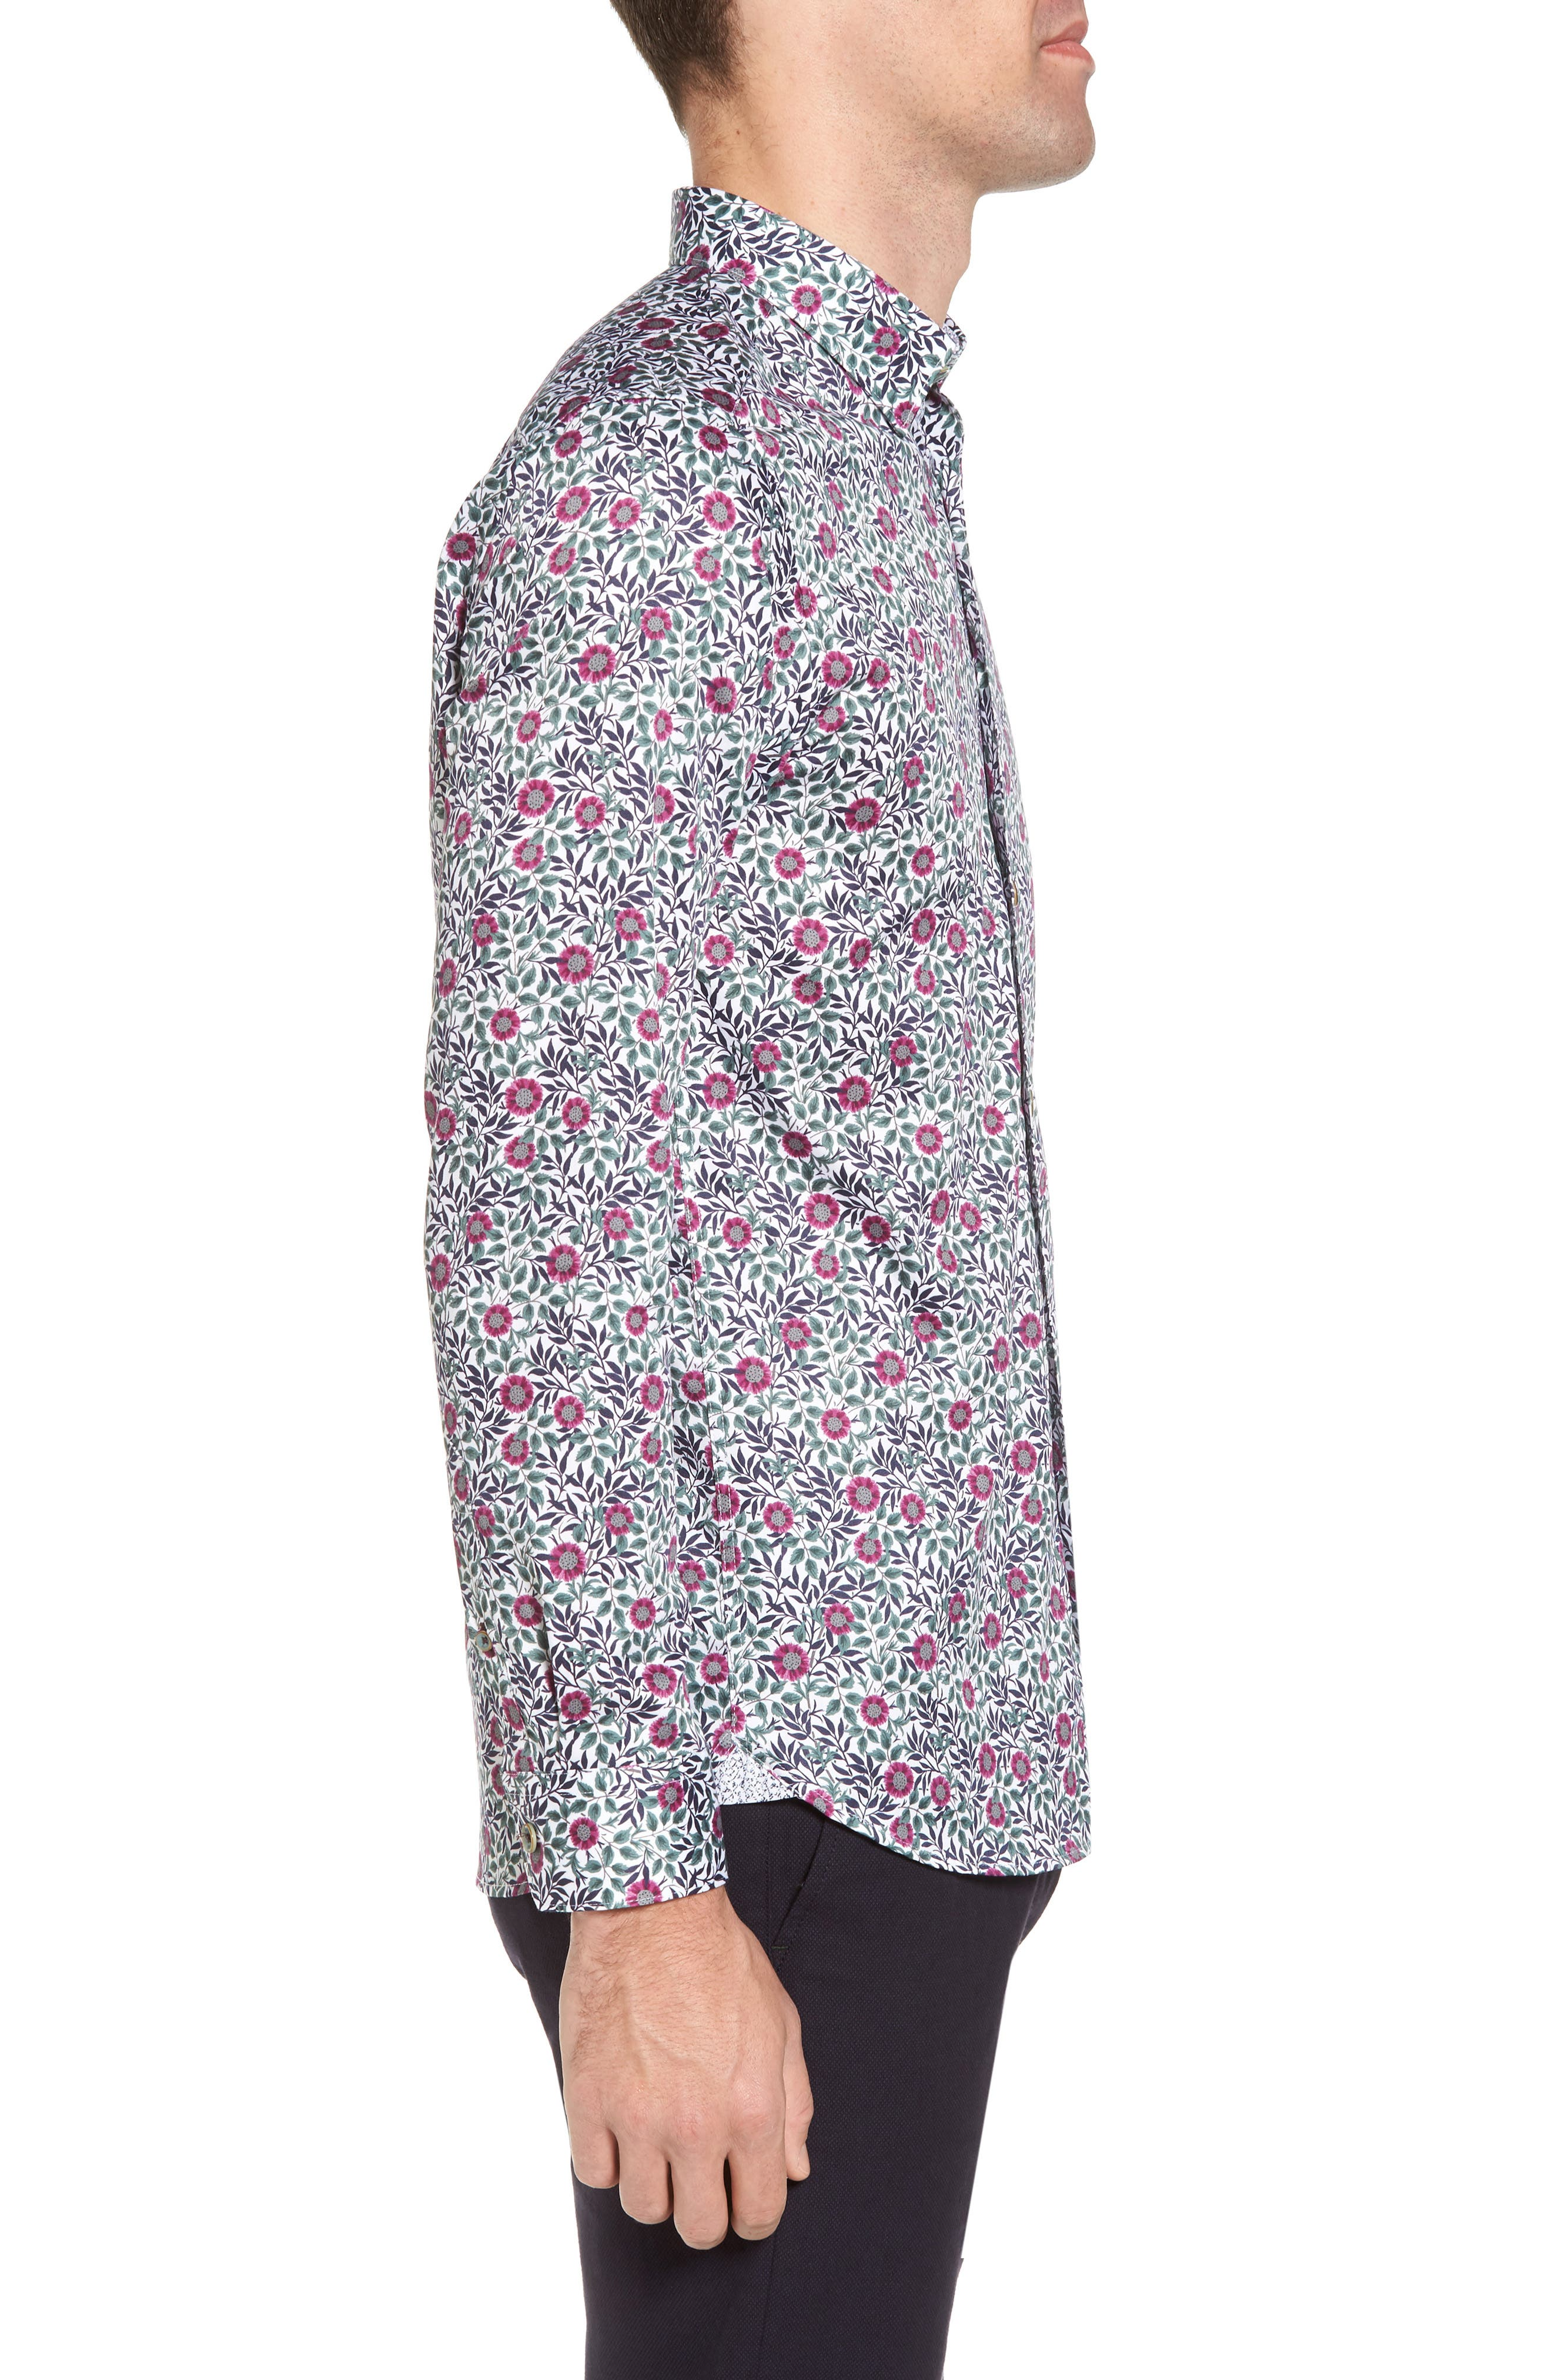 Orense Floral Print Slim Fit Shirt,                             Alternate thumbnail 4, color,                             Green